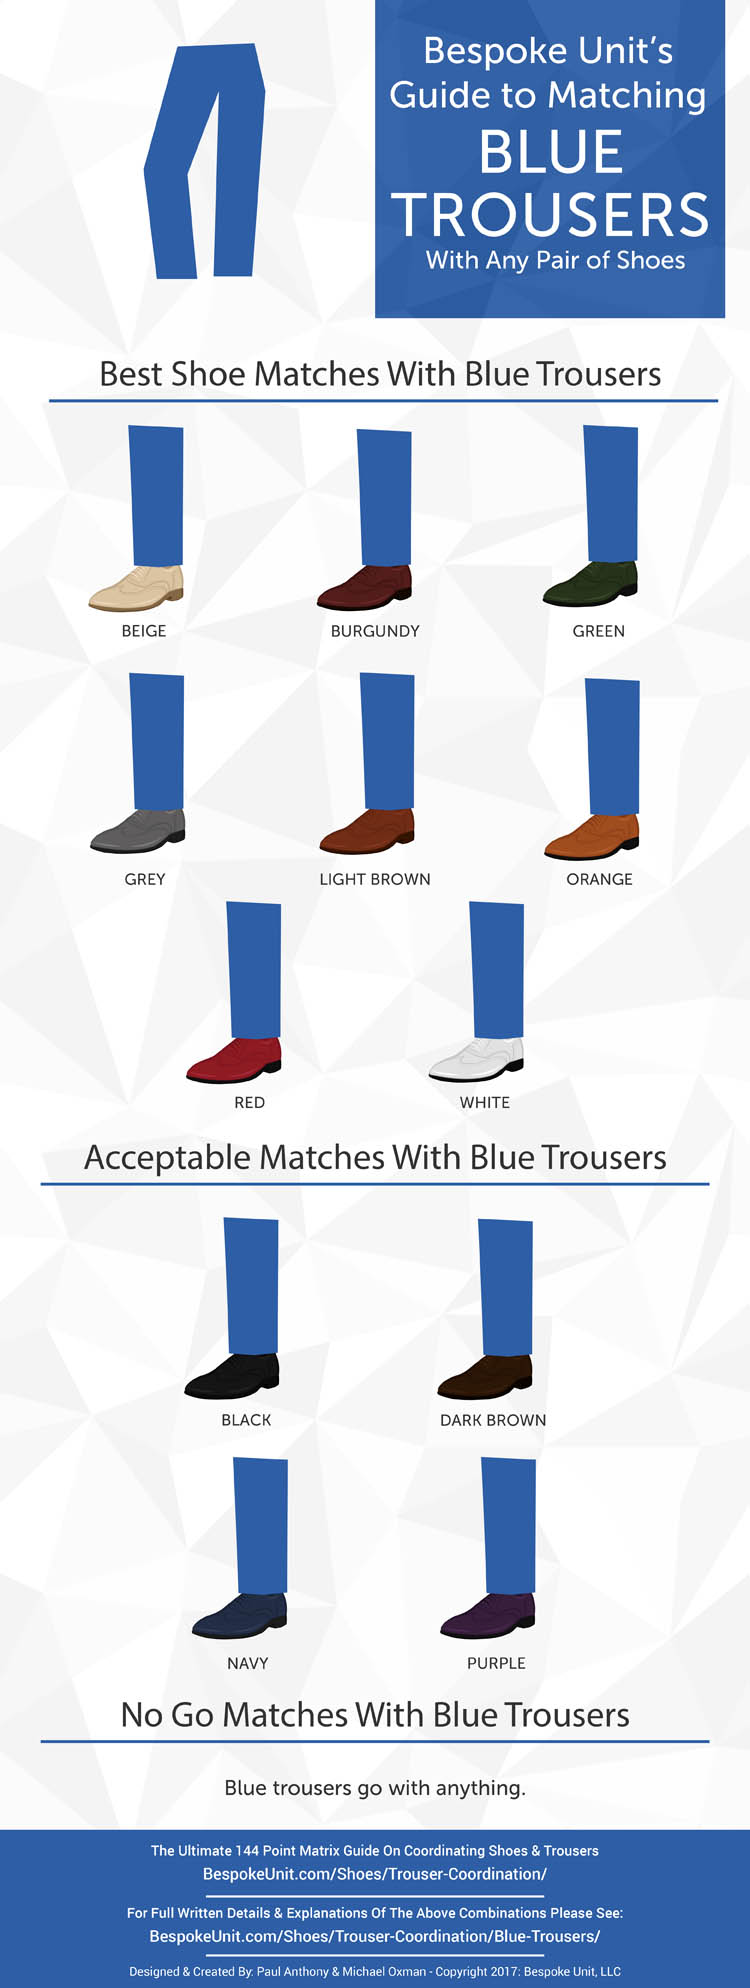 Blue-Trouser-Coordination-Graphic-Bespoke-Unit.jpg